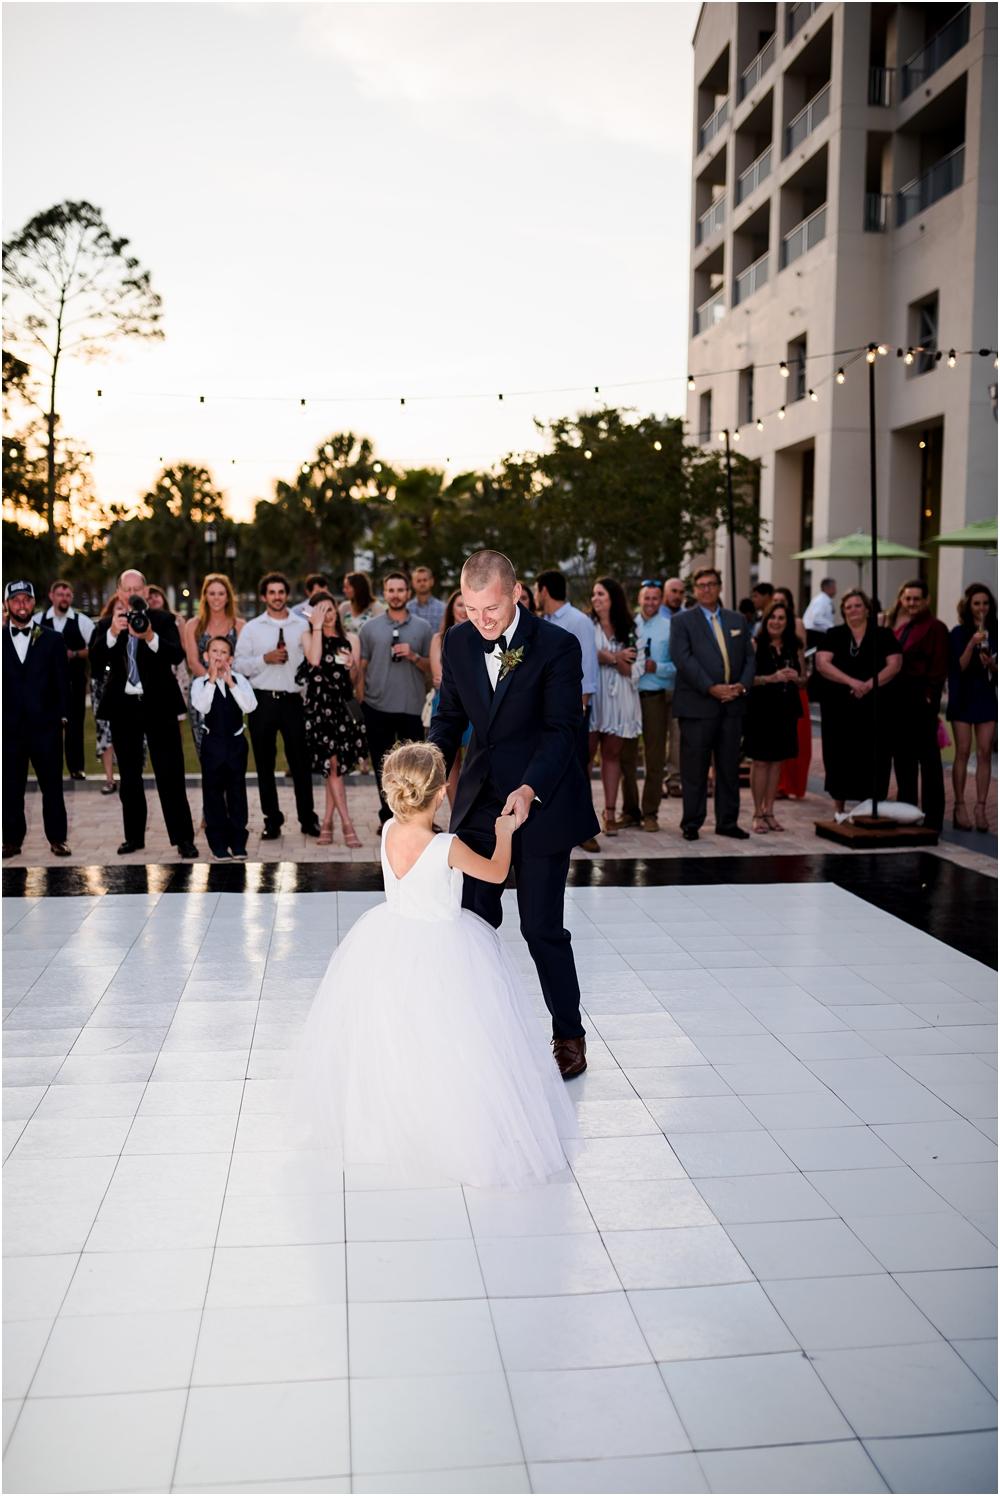 wilkins-sheraton-panama-city-beach-florida-wedding-dothan-tallahassee-kiersten-stevenson-photography-163.jpg